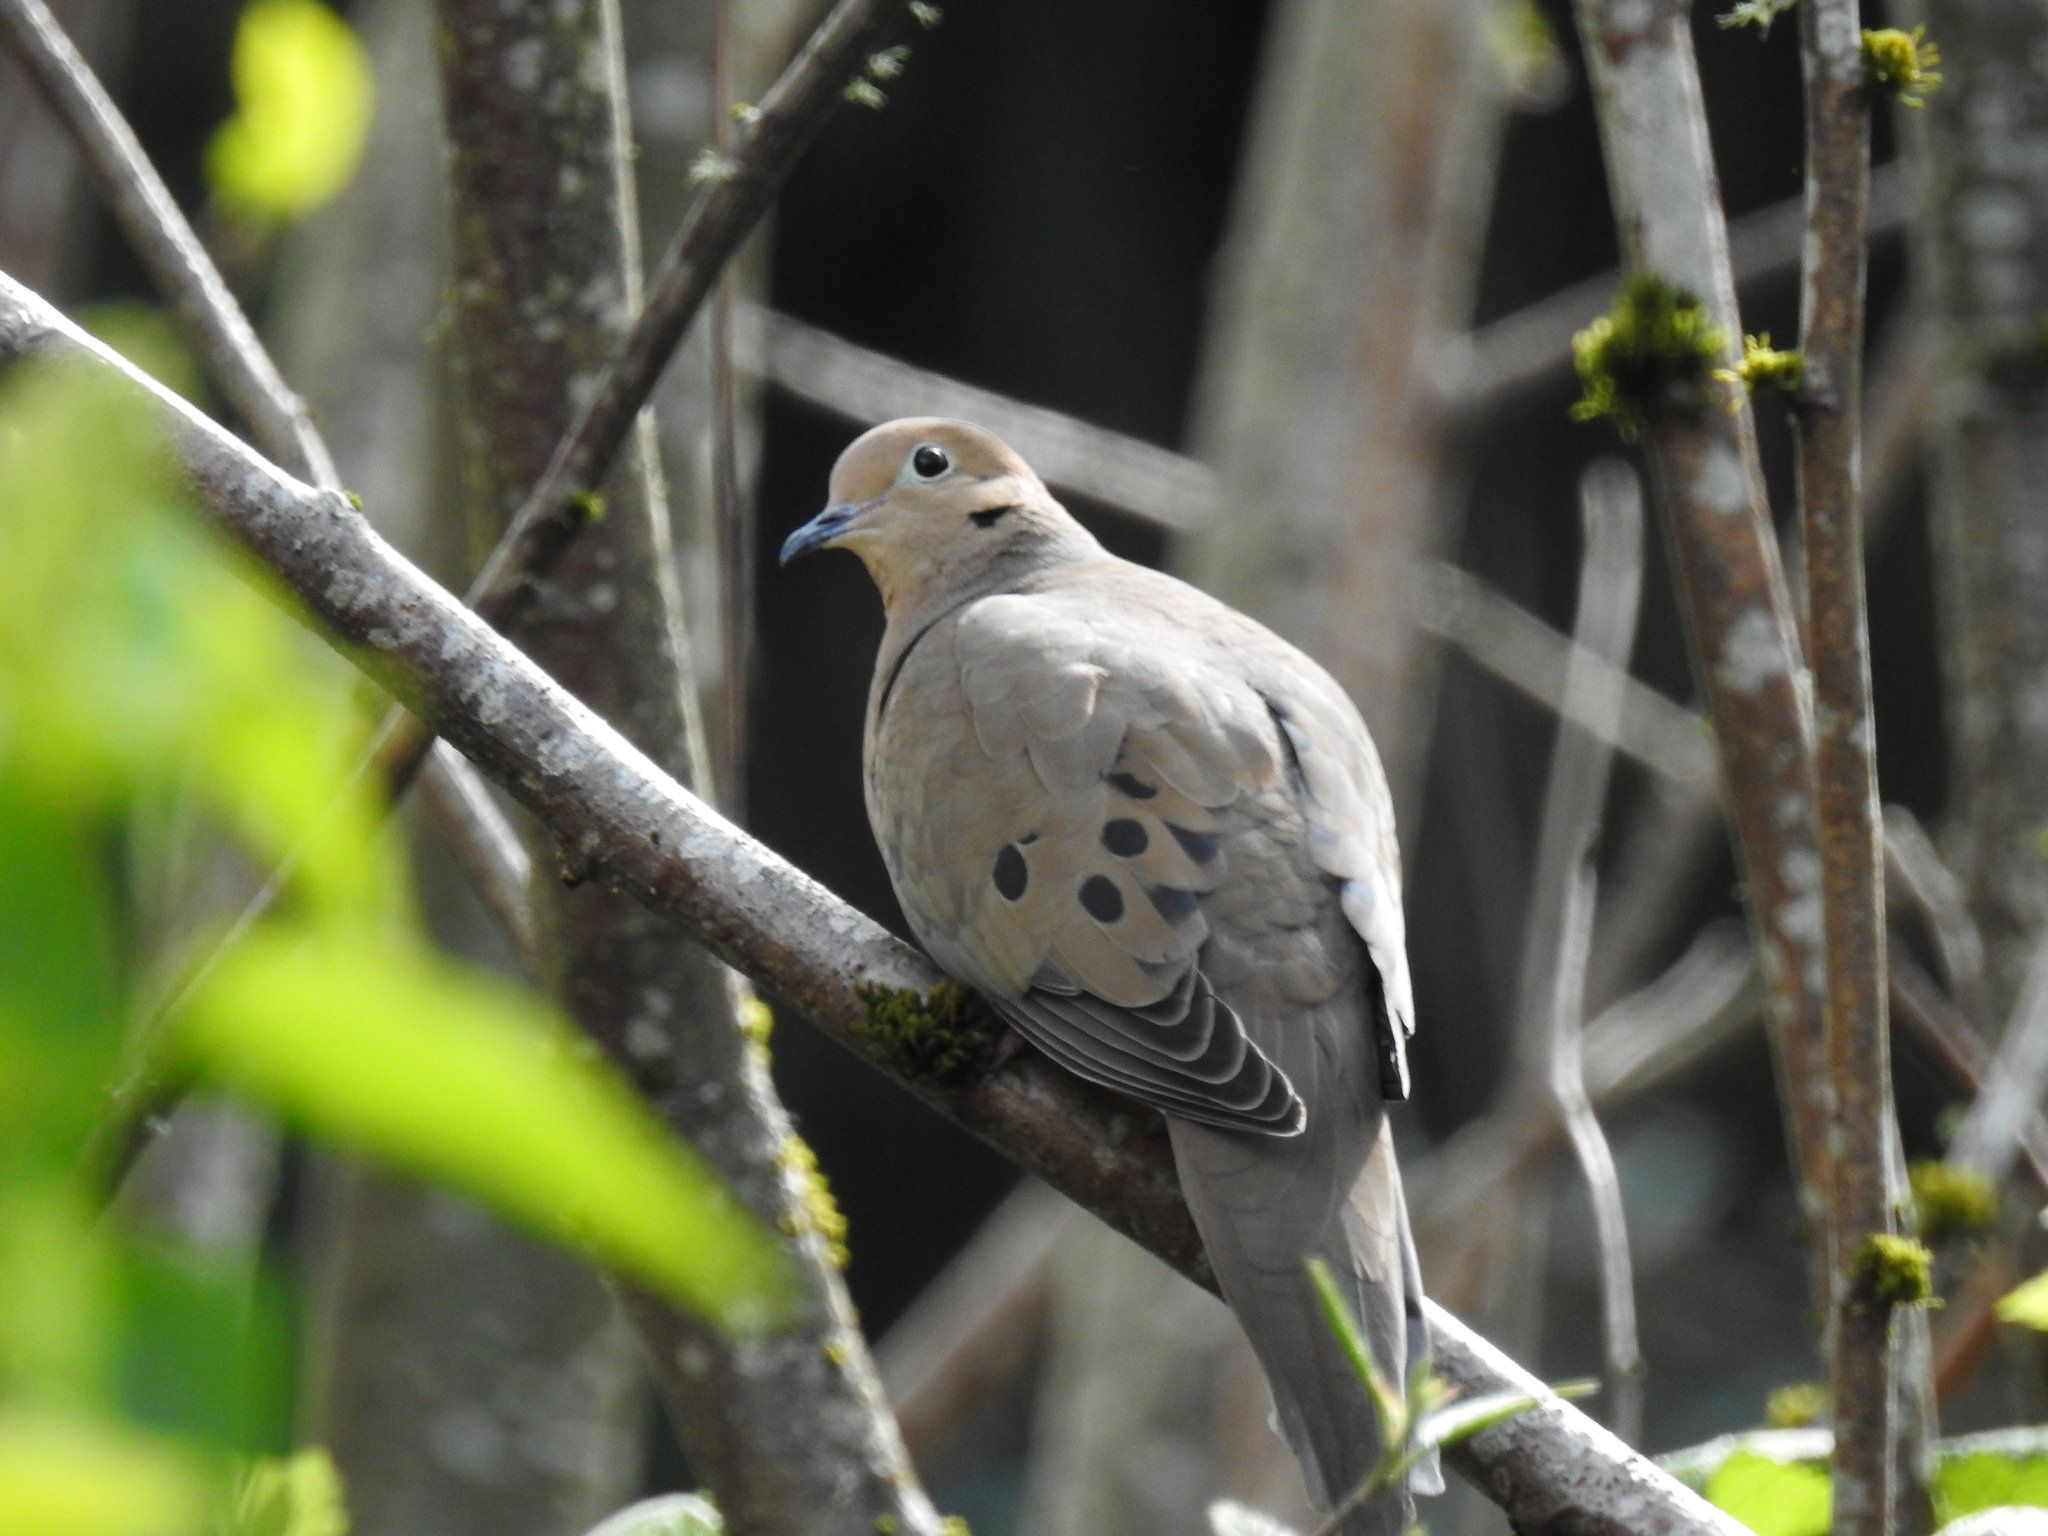 Backyard Birds (With images) | Backyard birds, Birds, Backyard on Birds Backyard Landscapes id=60812